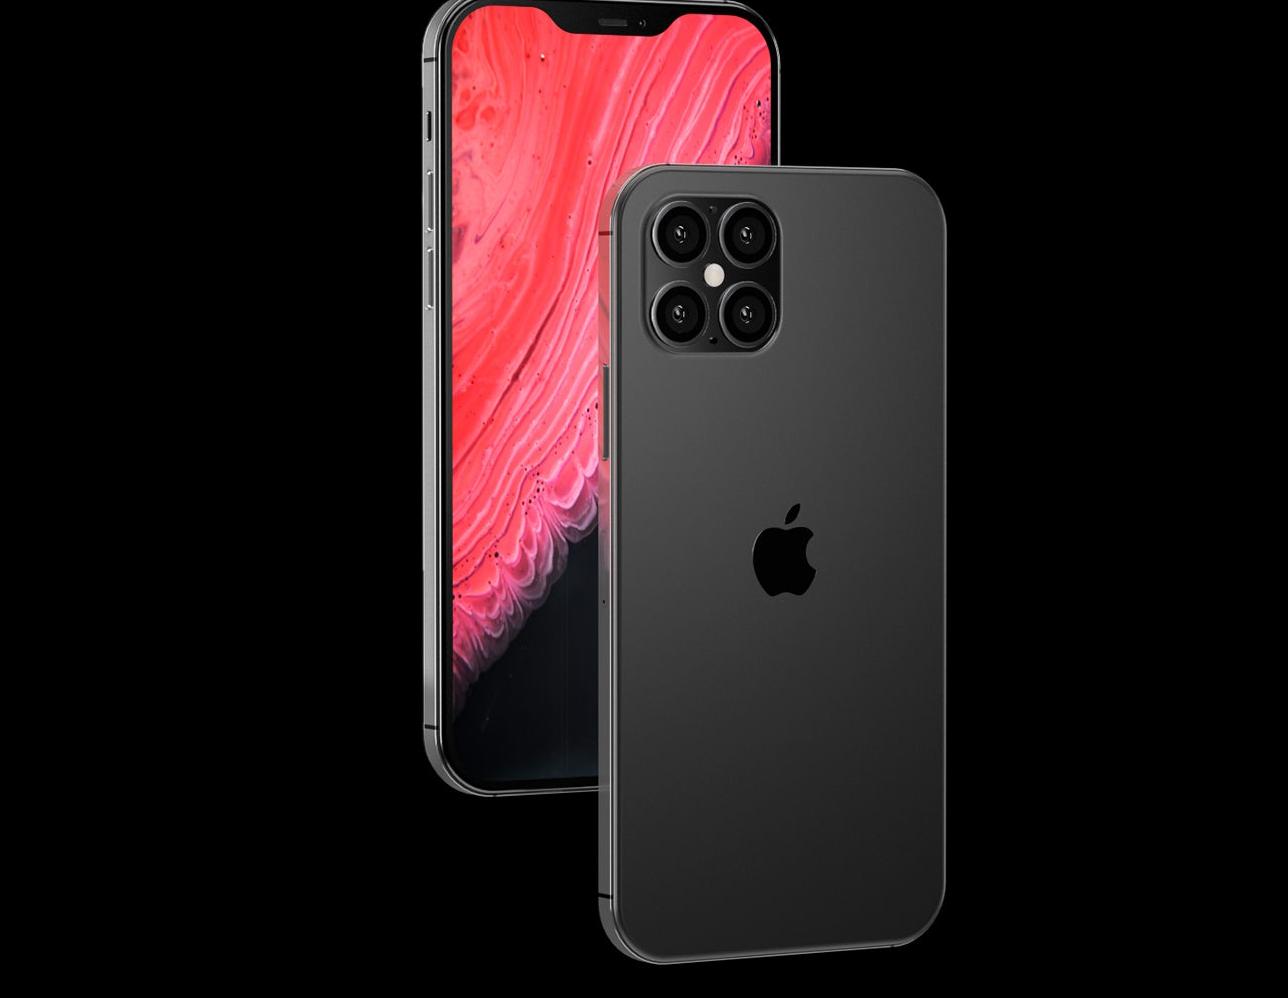 ابل تدعم هواتف Iphone 12 Pro العام المقبل بشاشات Oled من سامسونج In 2020 Iphone Apple Smartphone Apple Technology